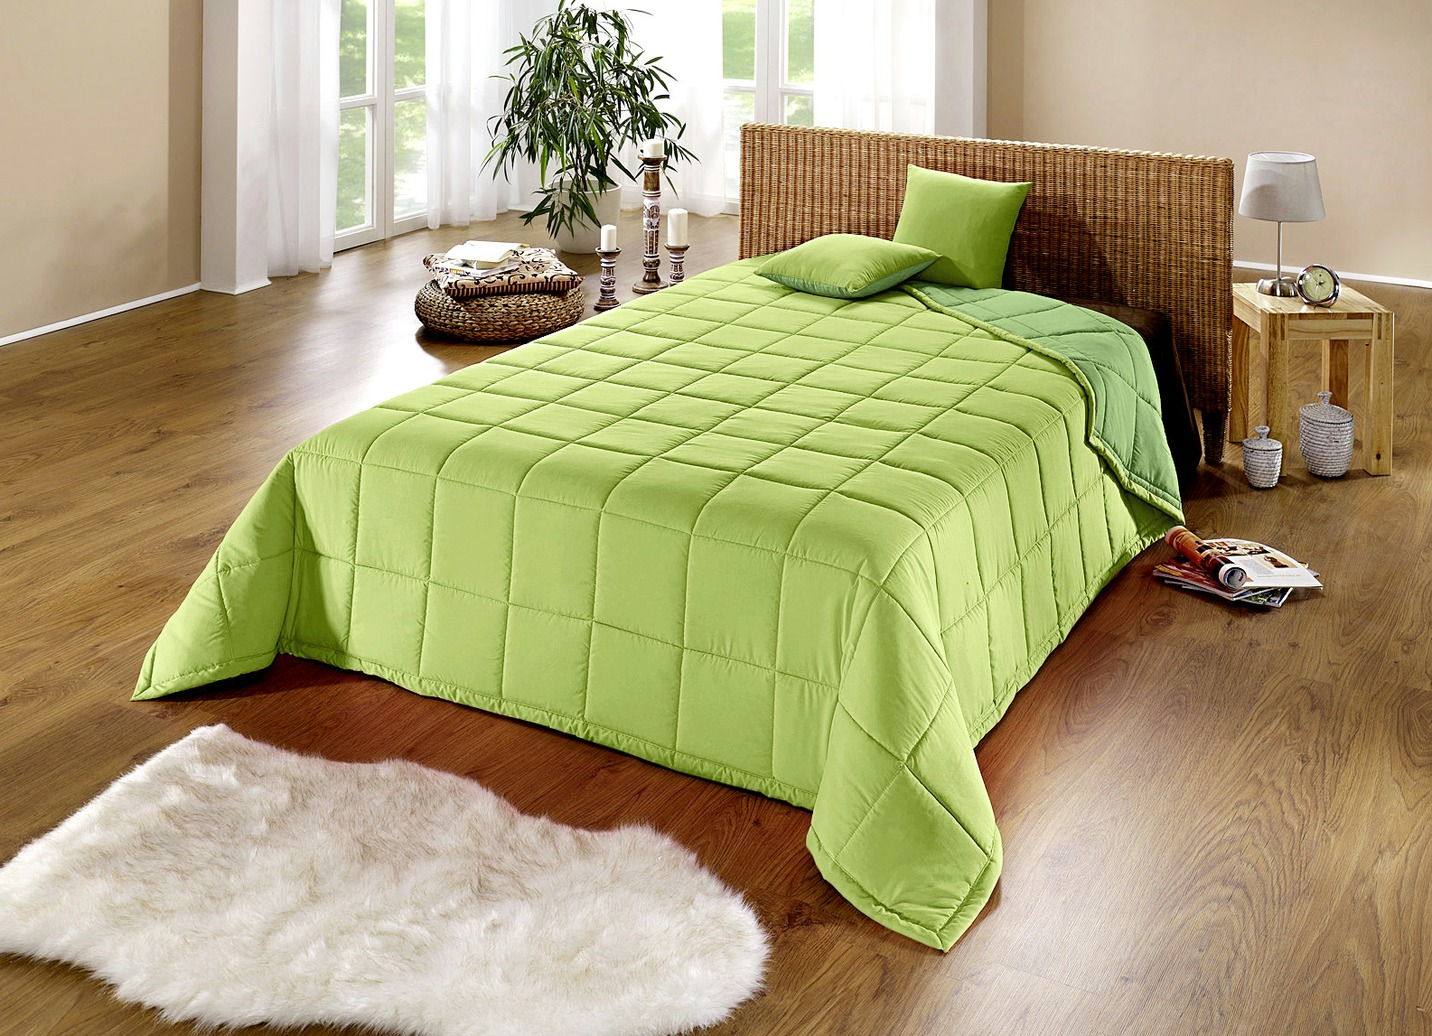 tagesdecke kissenh llen verschiedene ausf hrungen. Black Bedroom Furniture Sets. Home Design Ideas